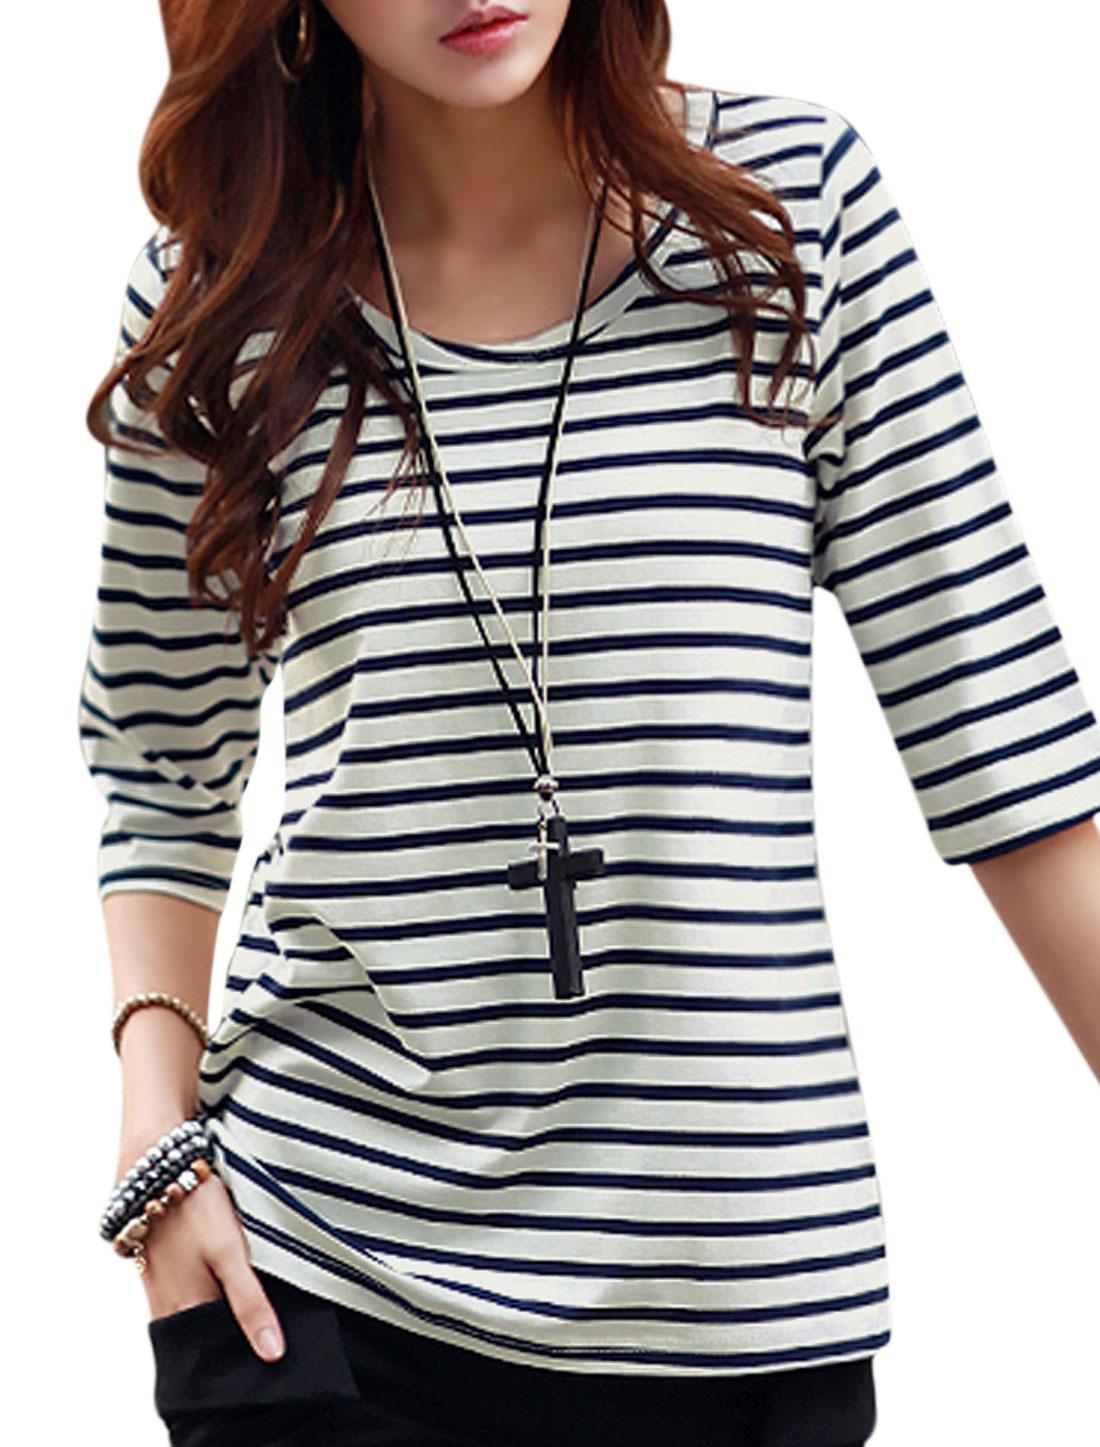 Ladies Three Quarter Sleeves Round Neck Striped Tee Navy Blue XS